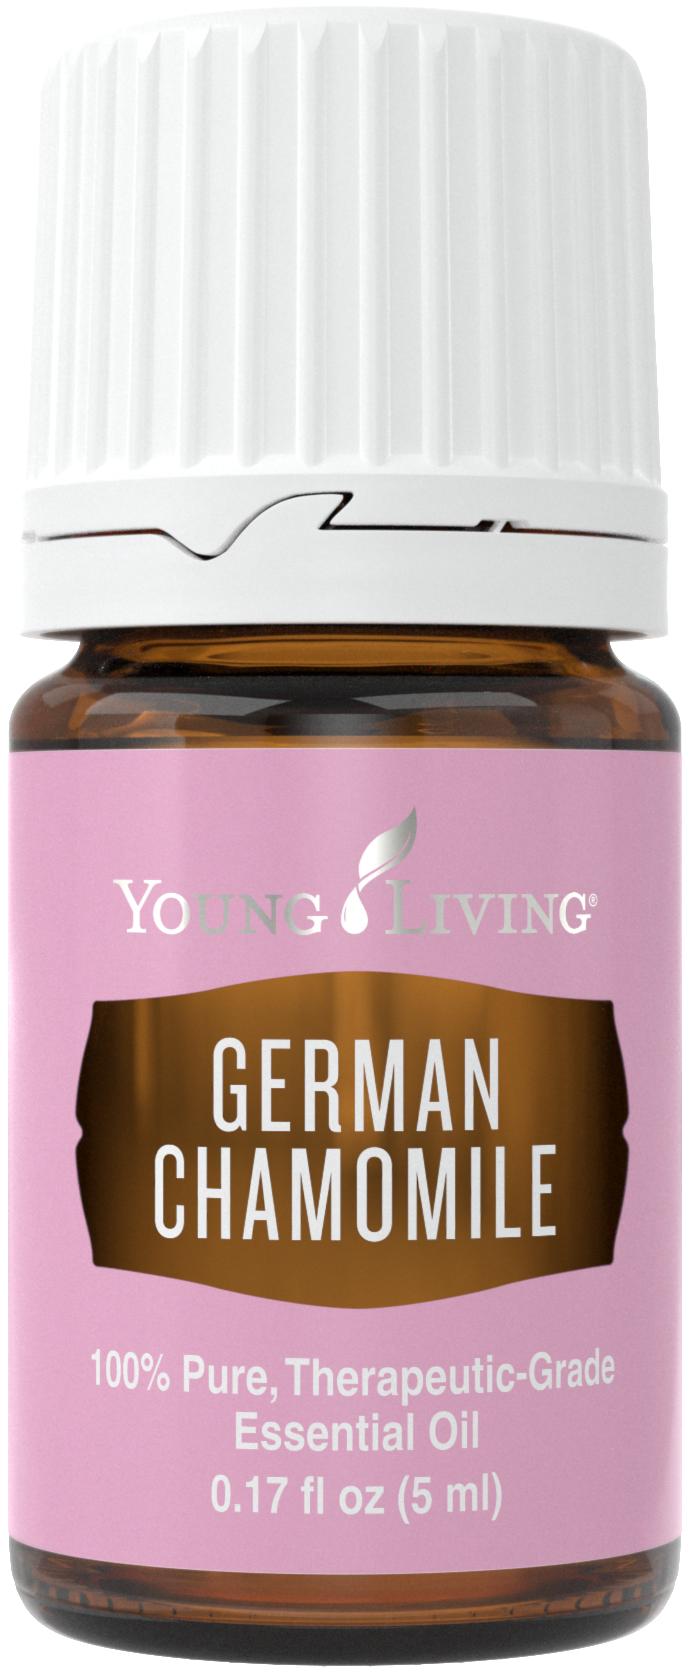 germanchamomile_5ml_silo_us_2016_24419031762_o